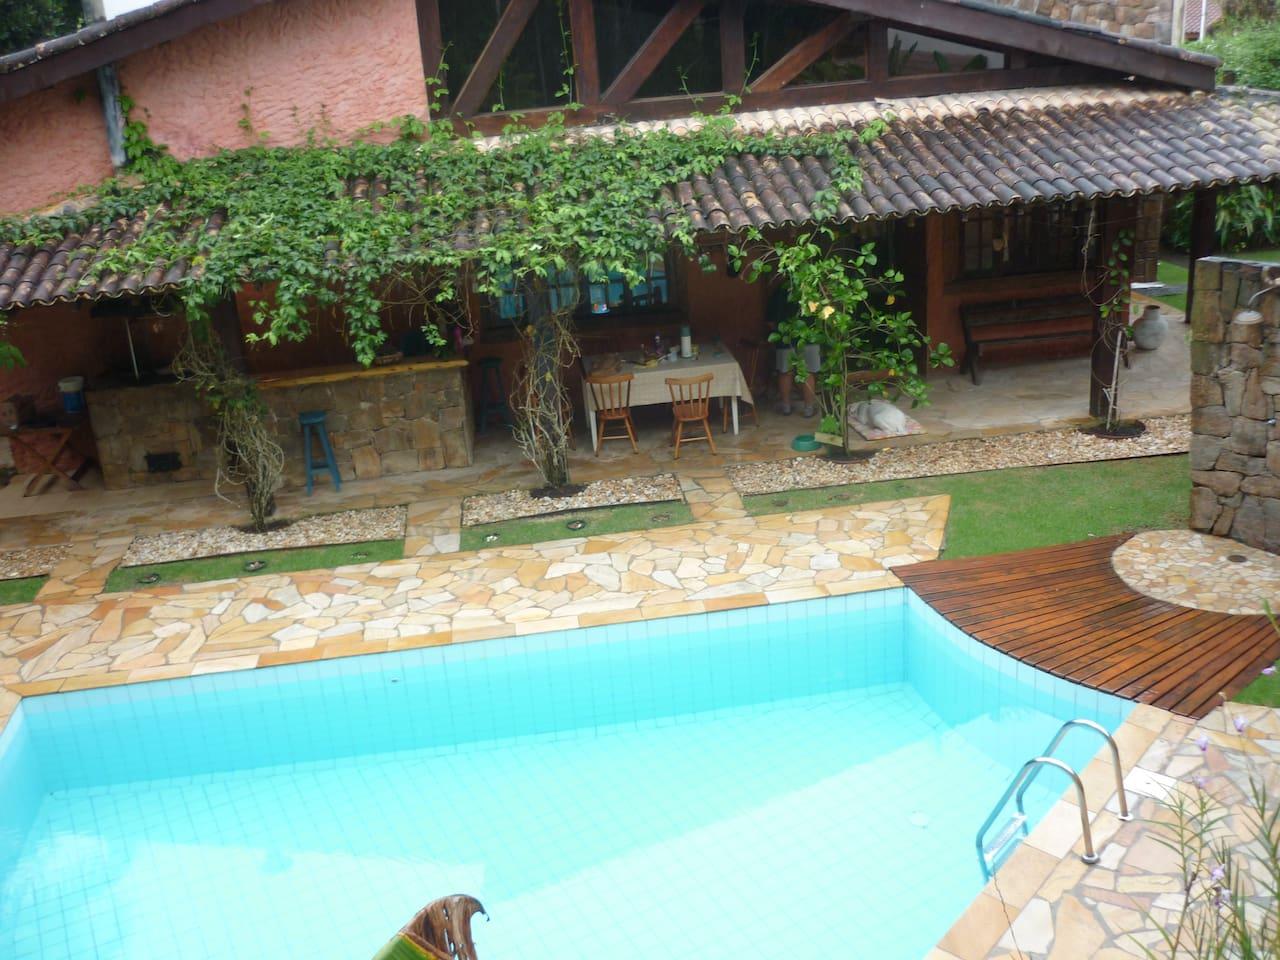 piscina e varanda